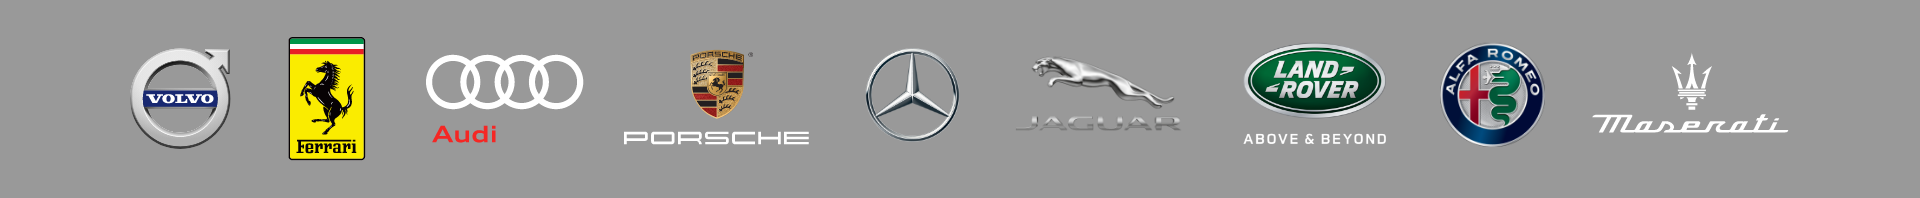 luxury logo banner